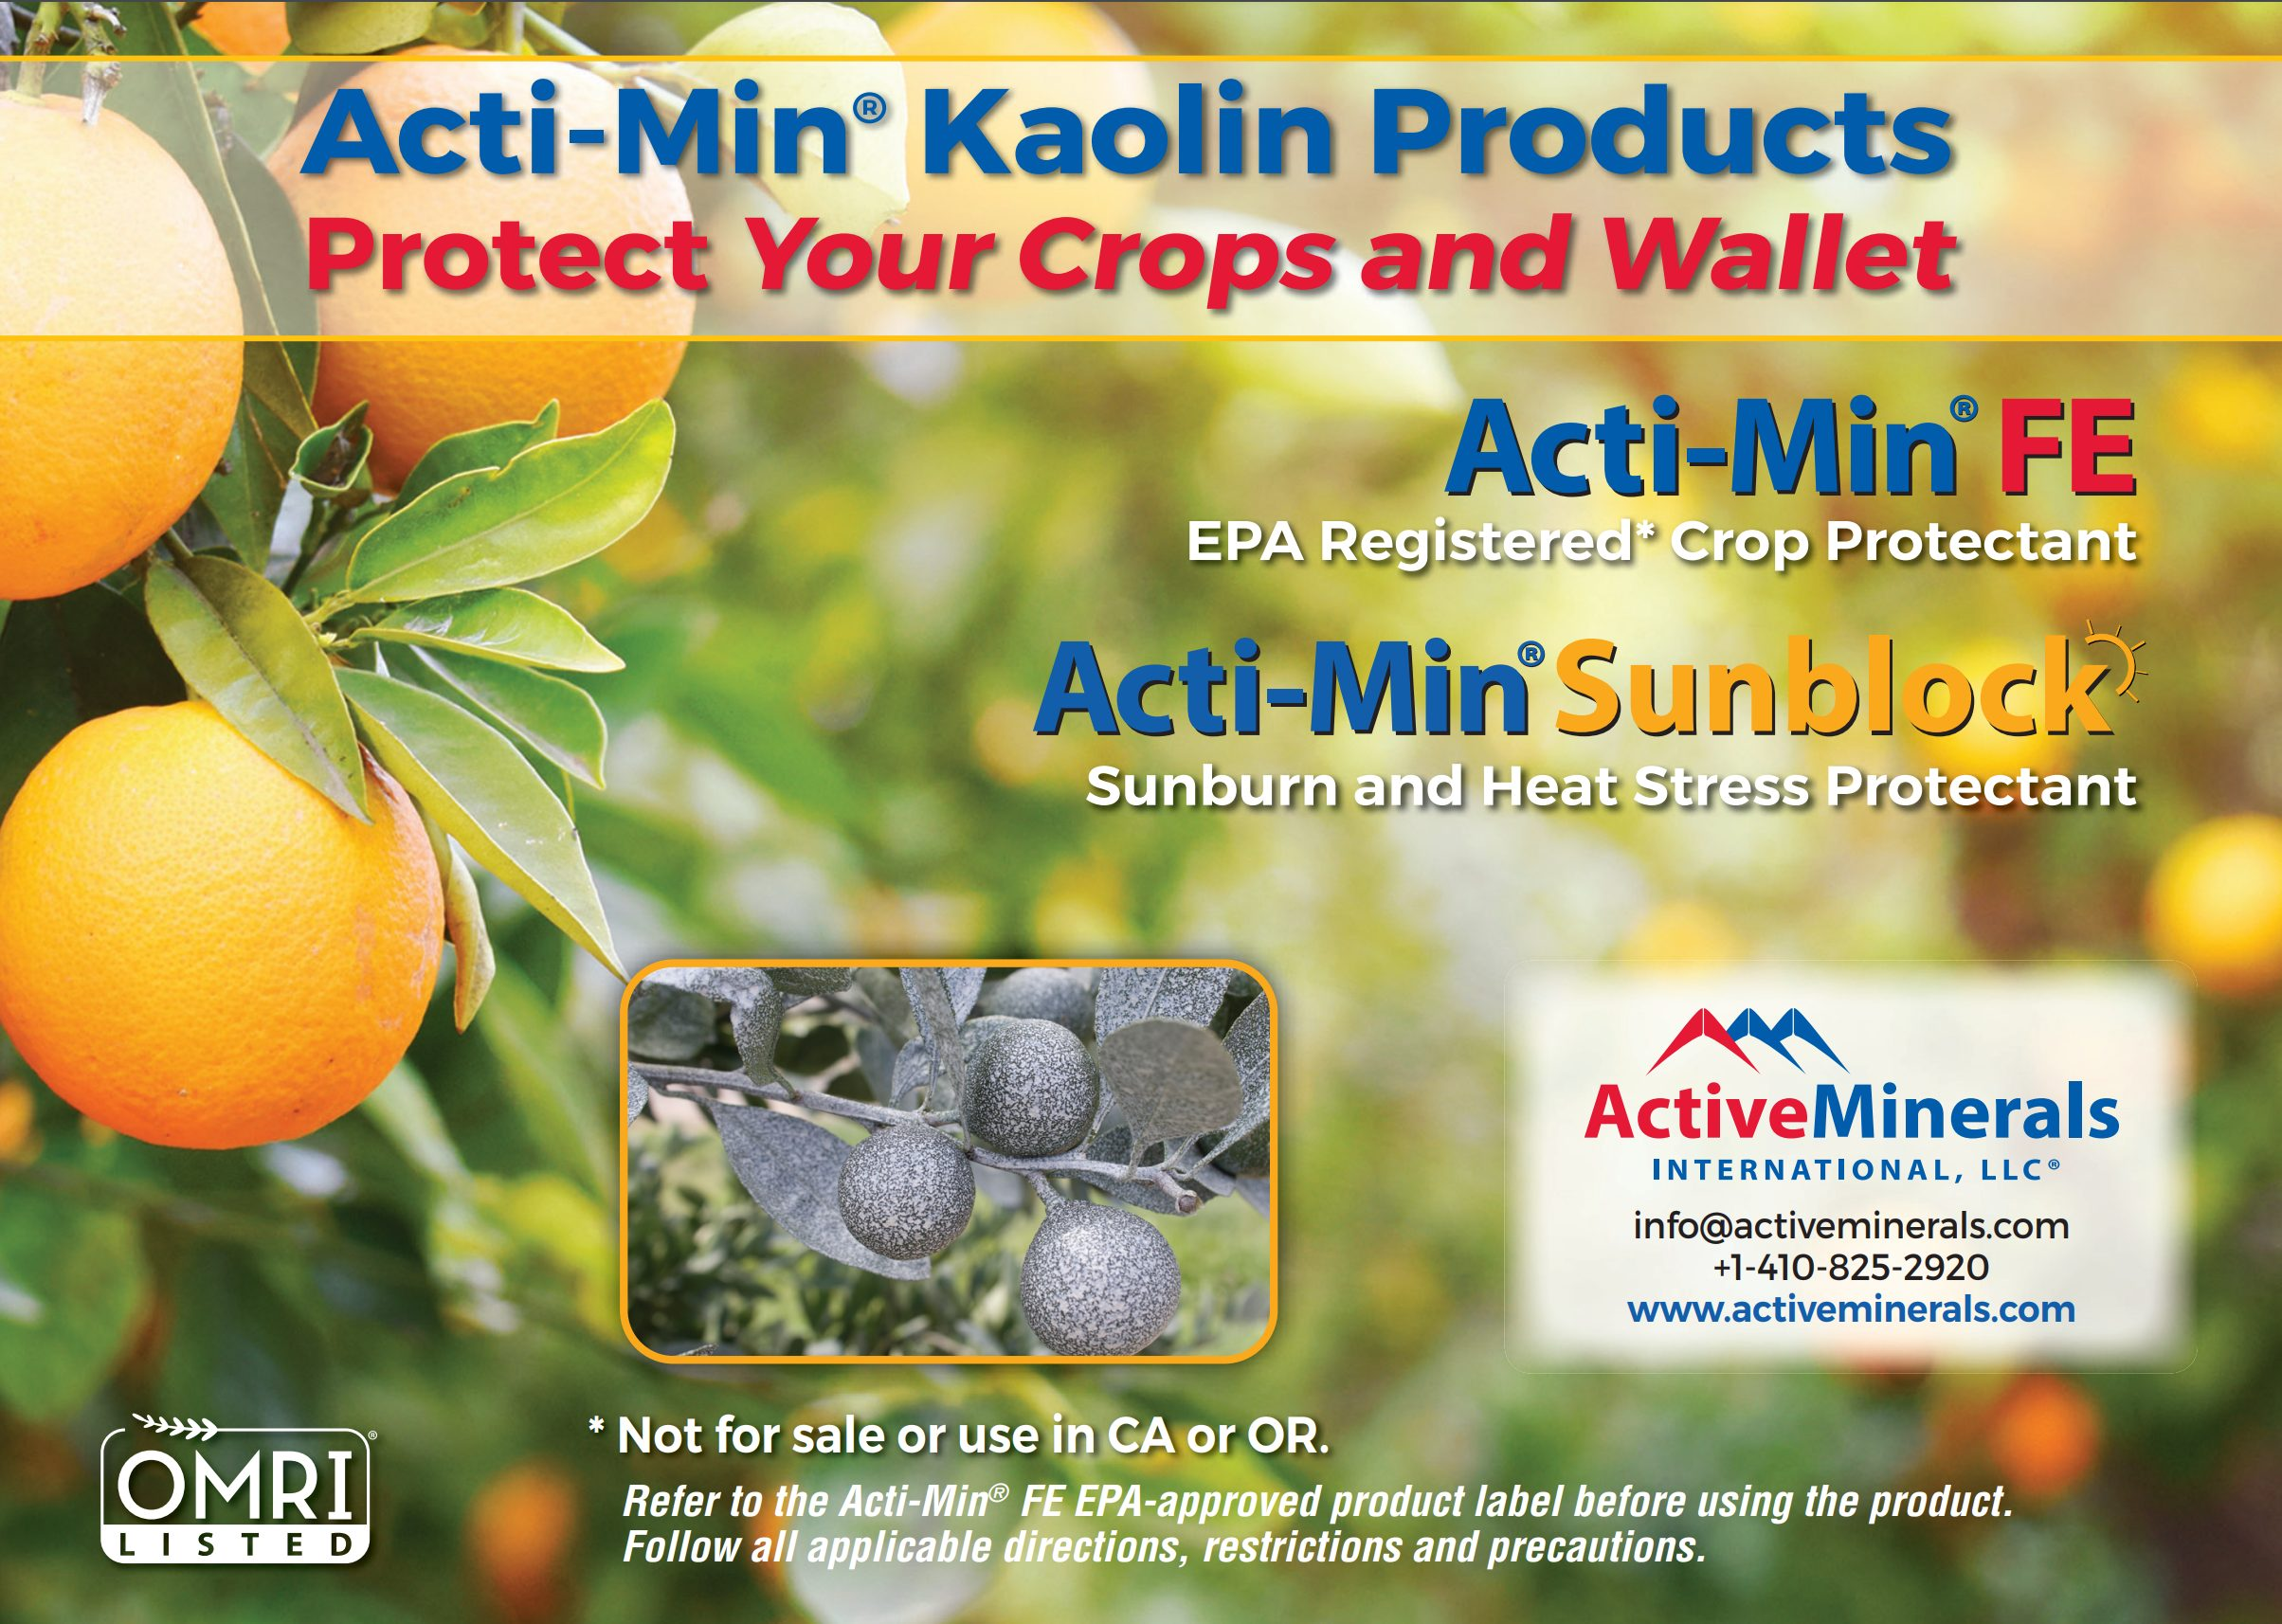 Actimin Kaolin Product Ad